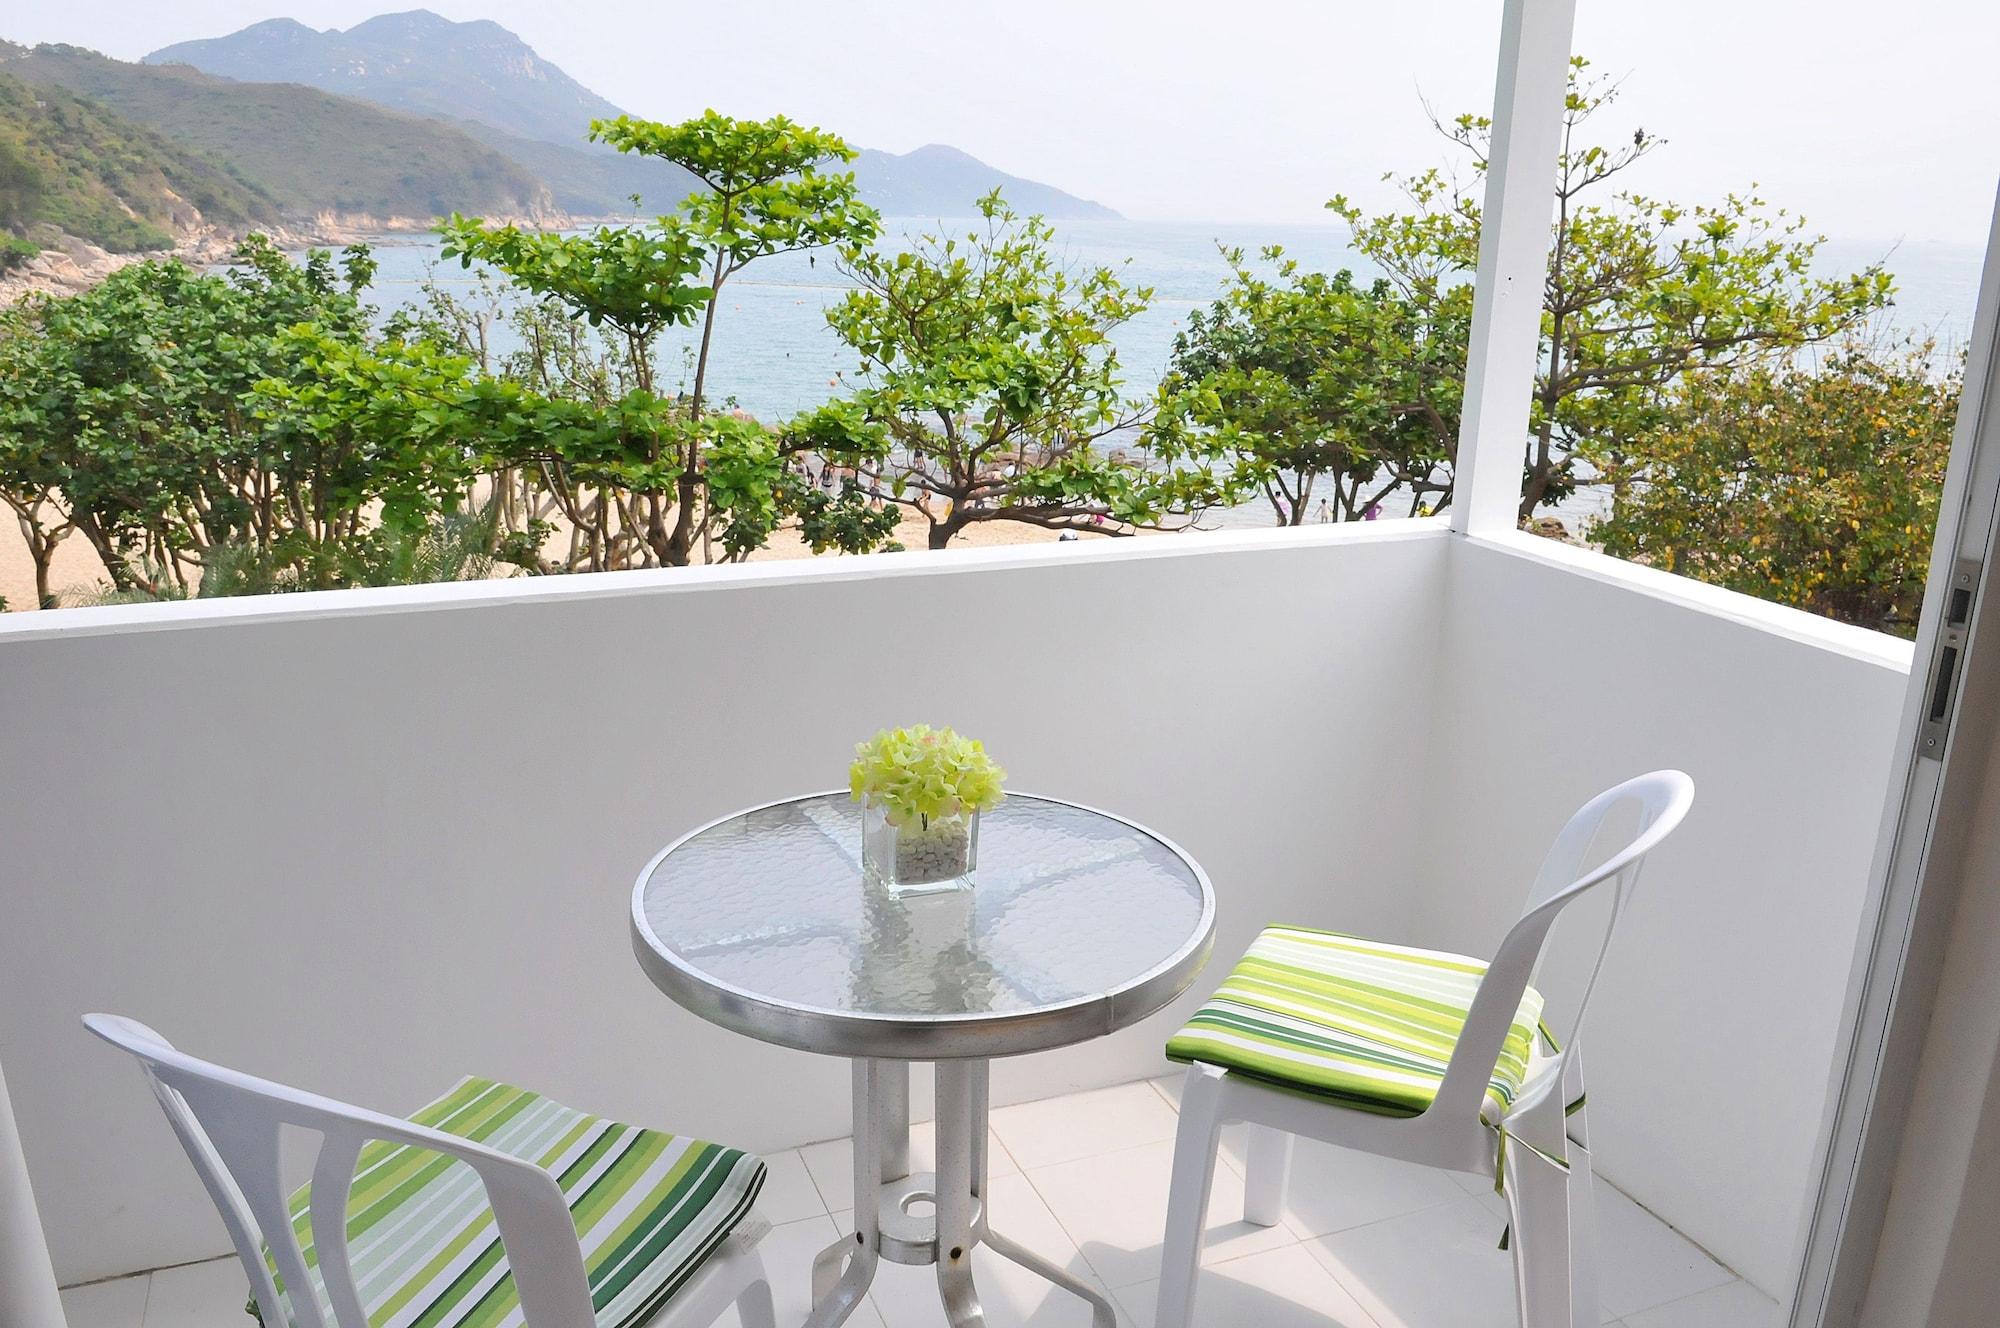 Concerto Inn, Lantau Islands